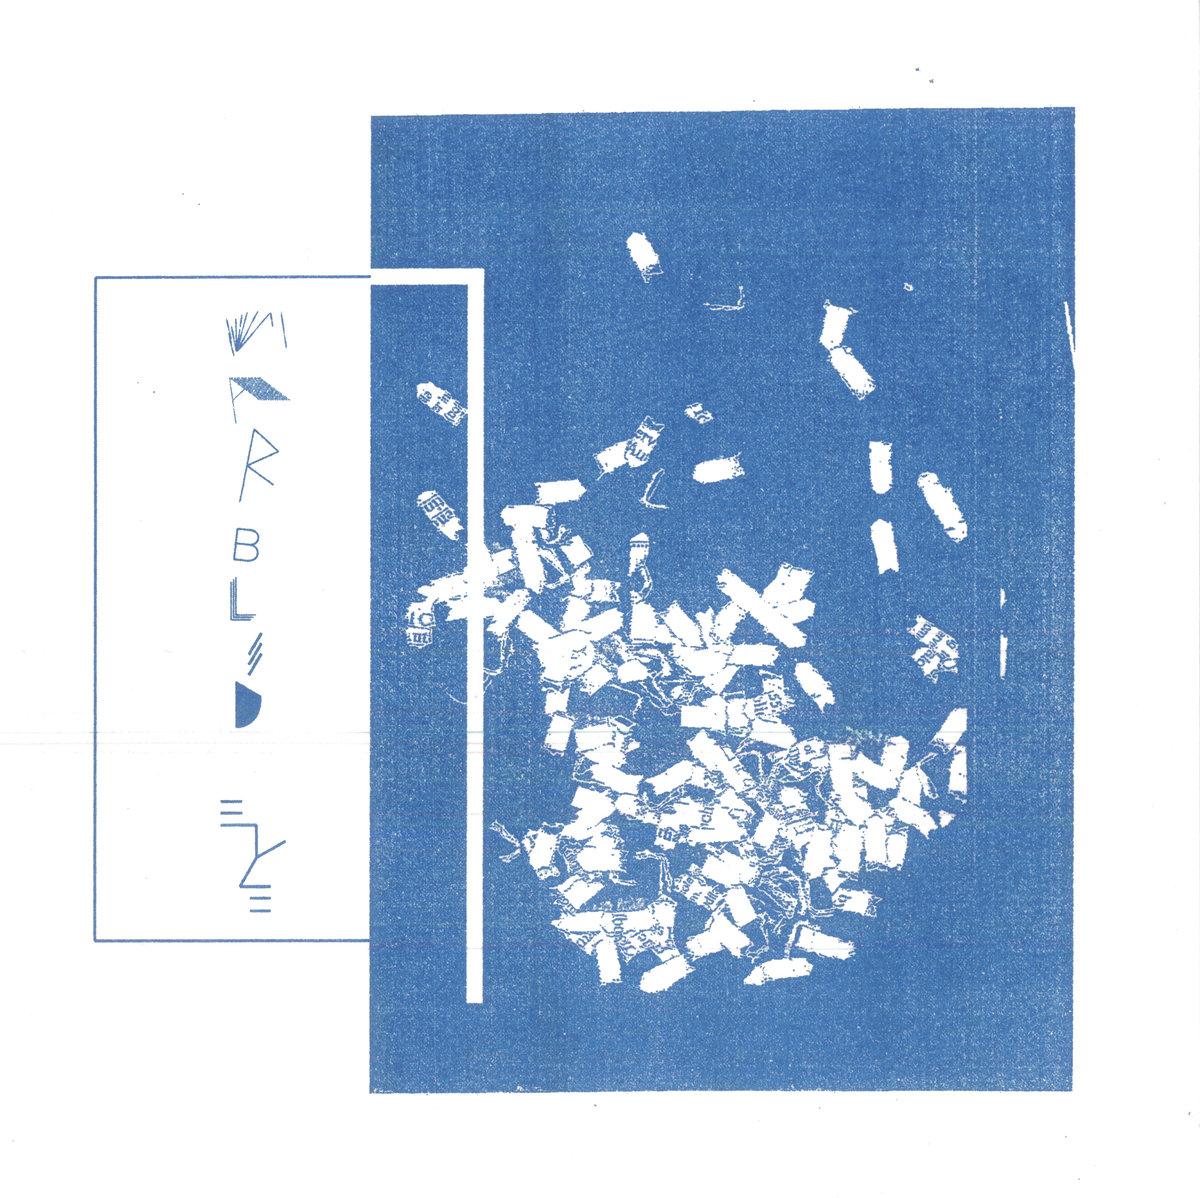 Marbled Eye - EP2 7